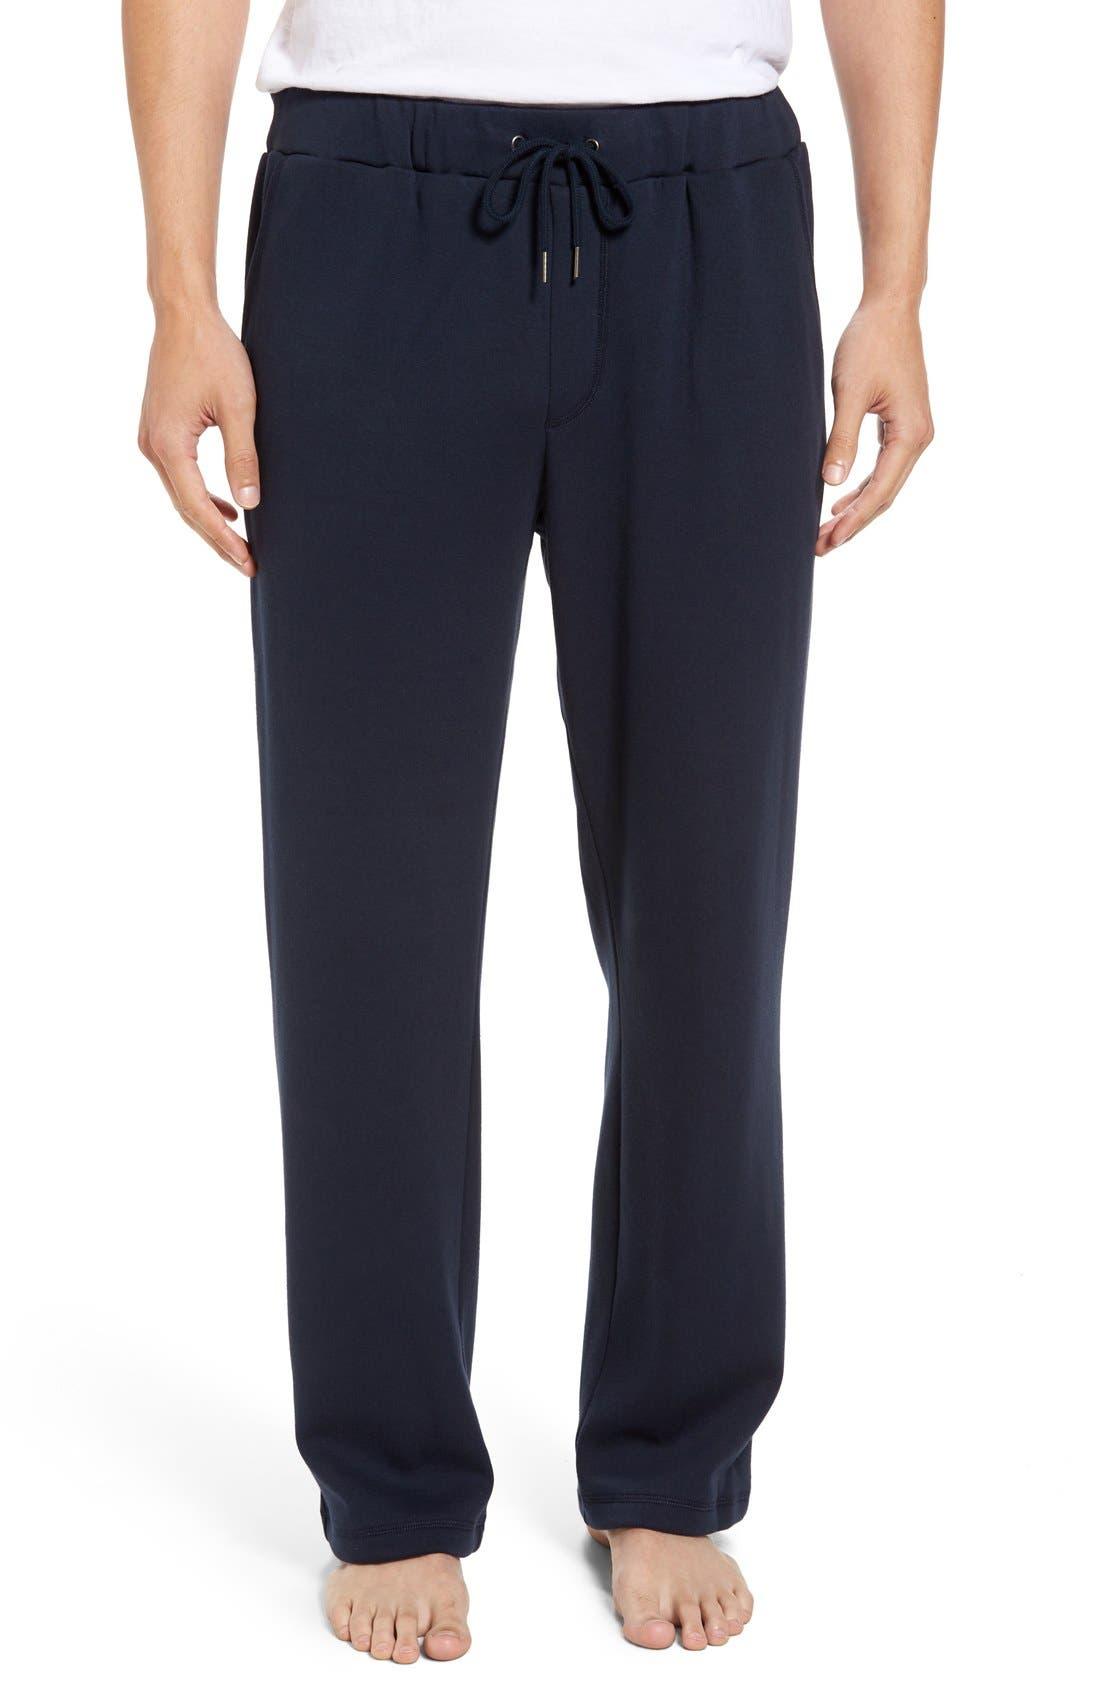 Main Image - Nordstrom Fleece Lounge Pants